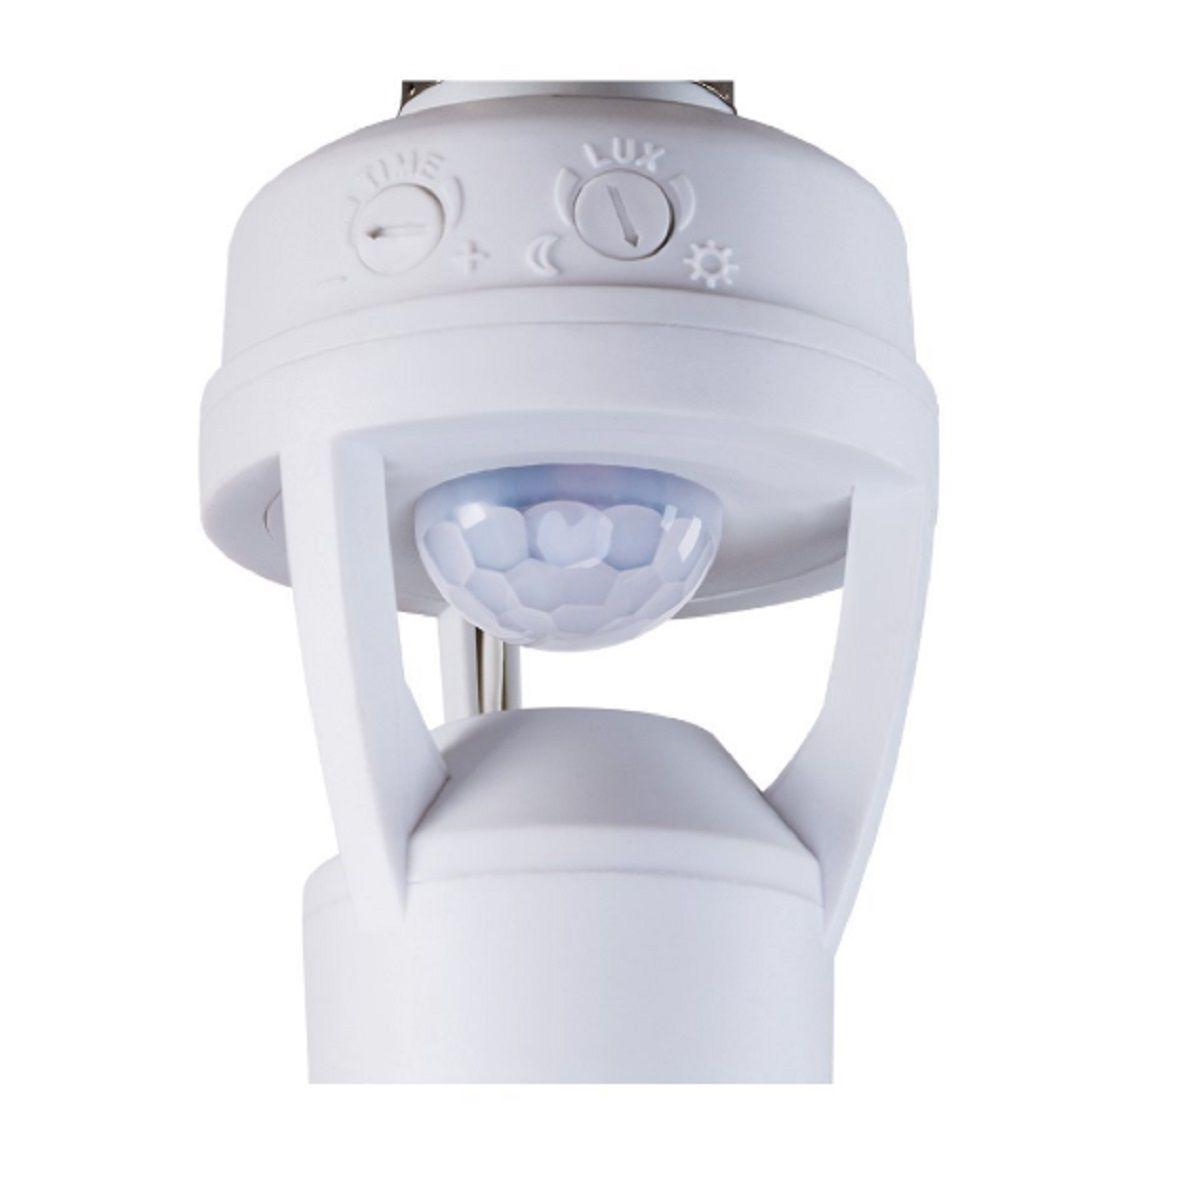 Interruptor Sensor Presenca Iluminacao Esp 360s Intelbras